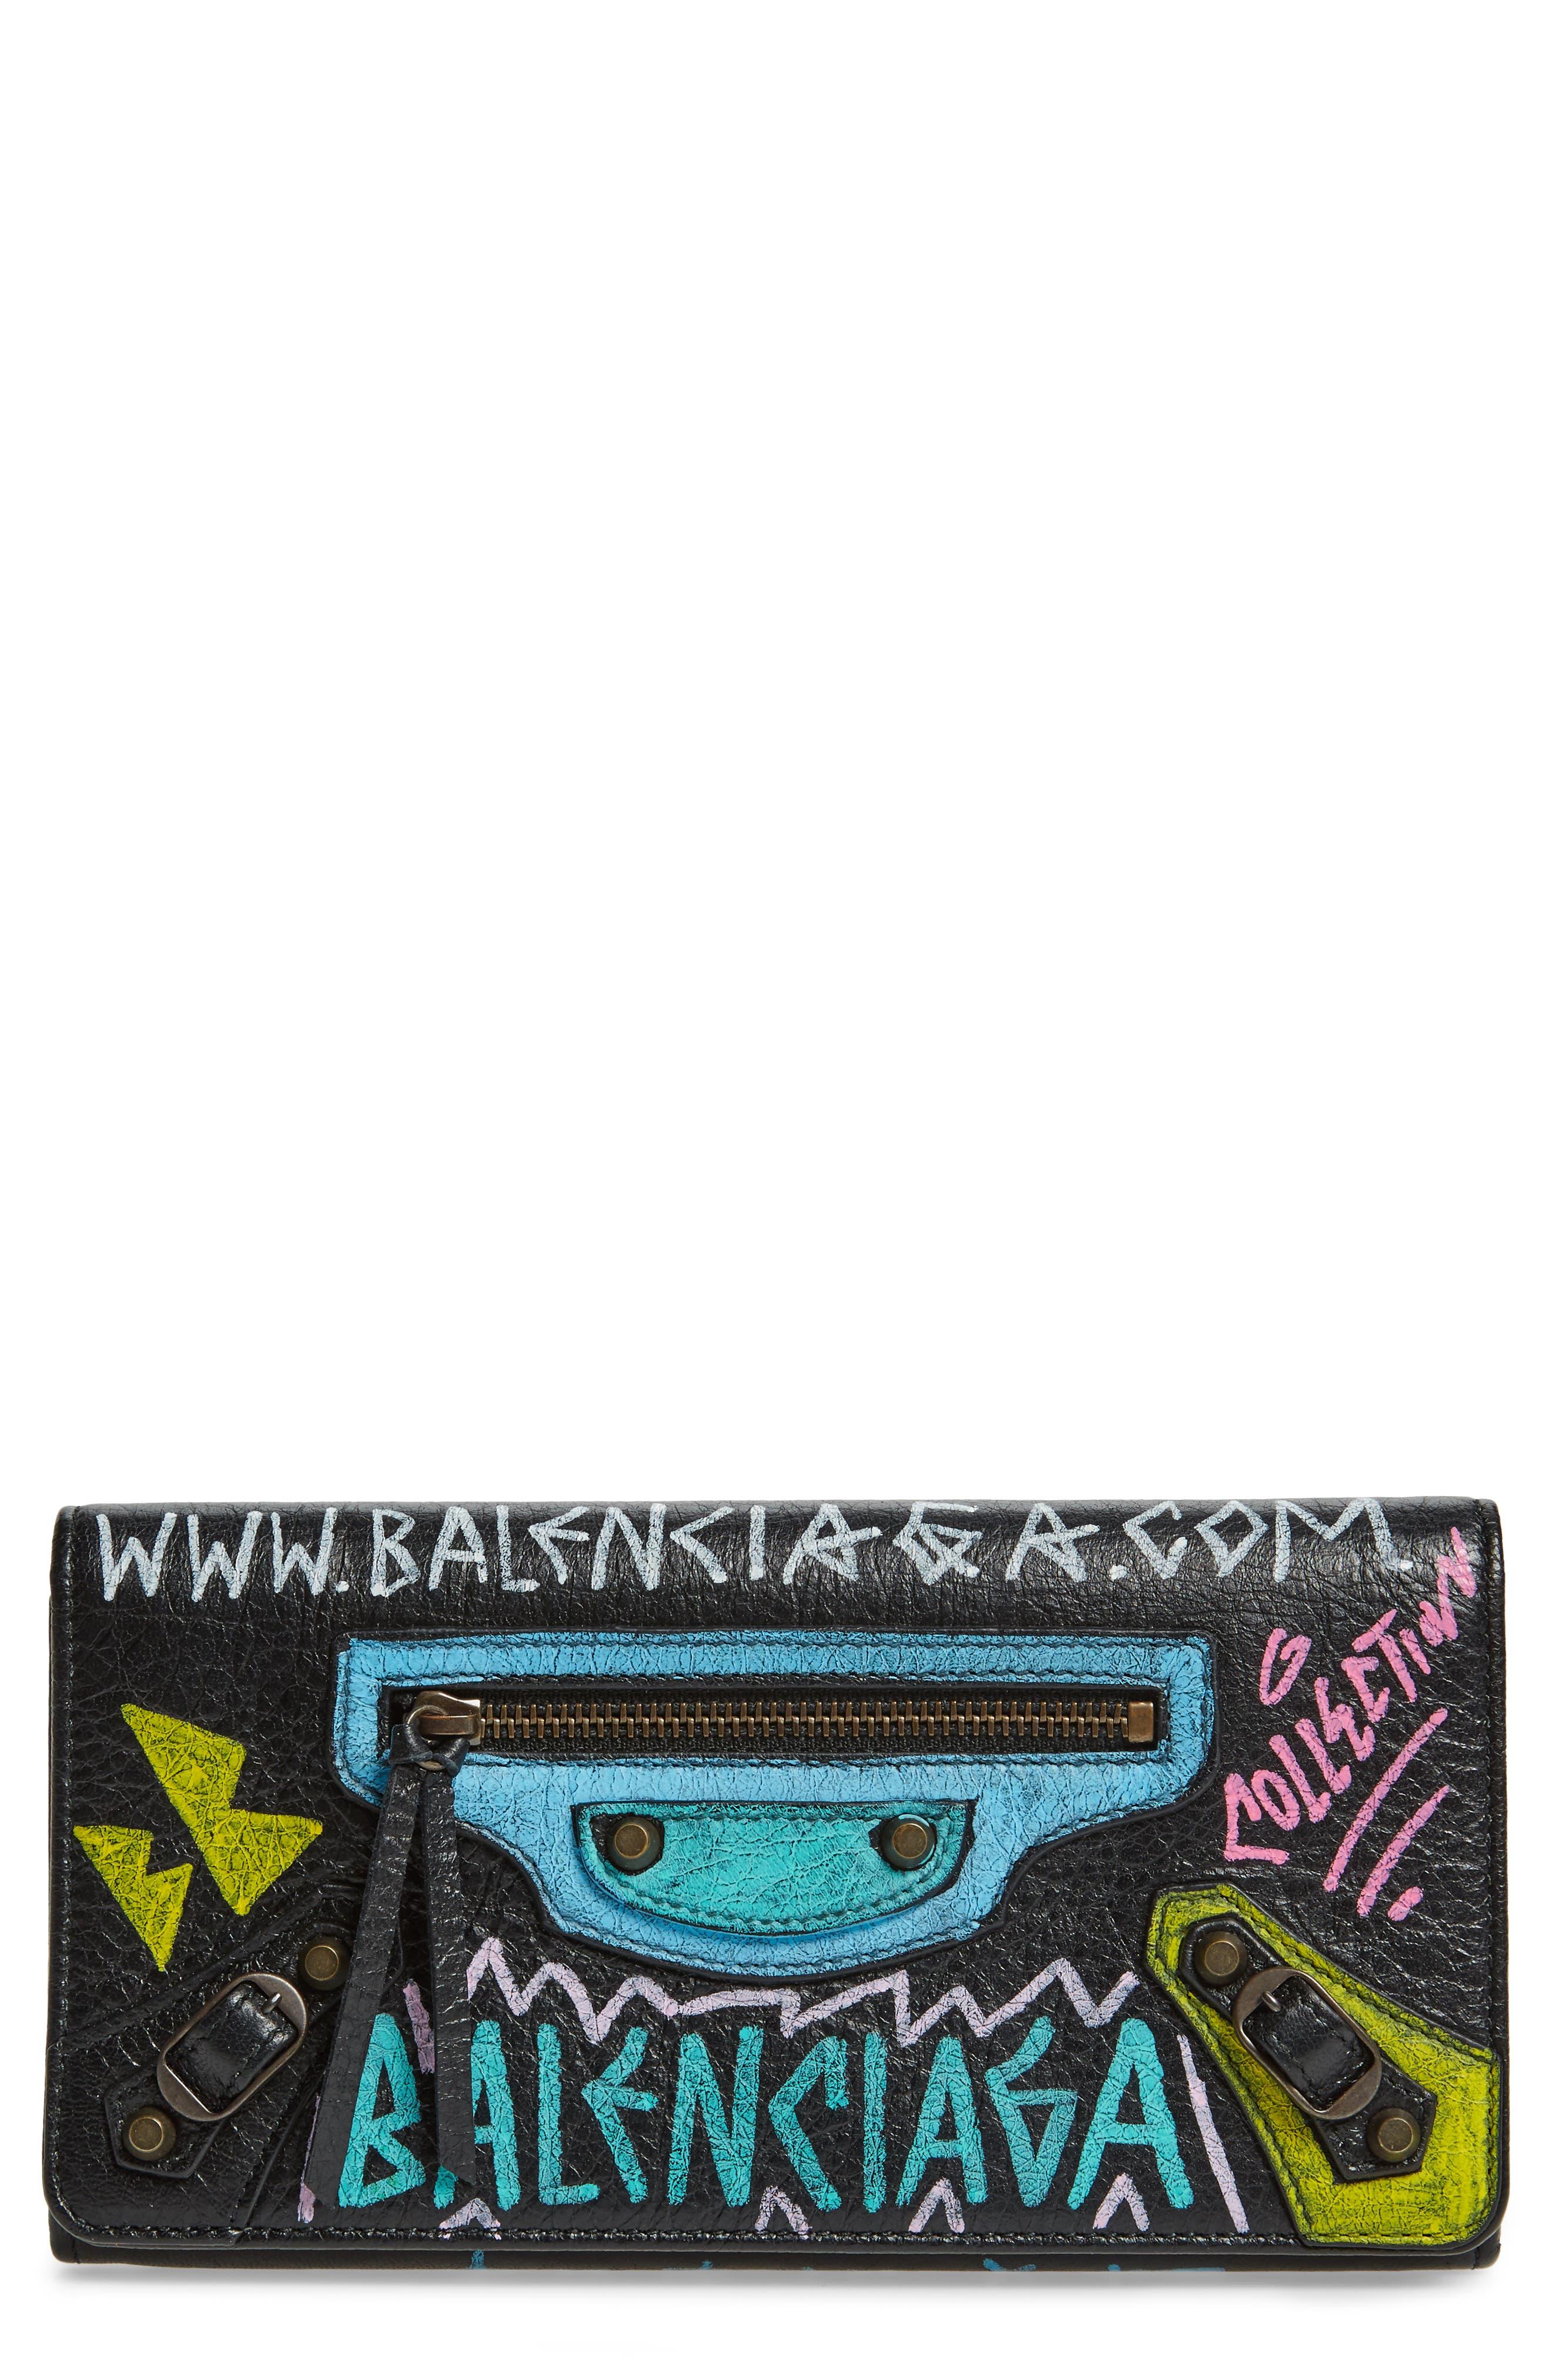 Main Image - Balenciaga Classic Graffiti Leather Wallet